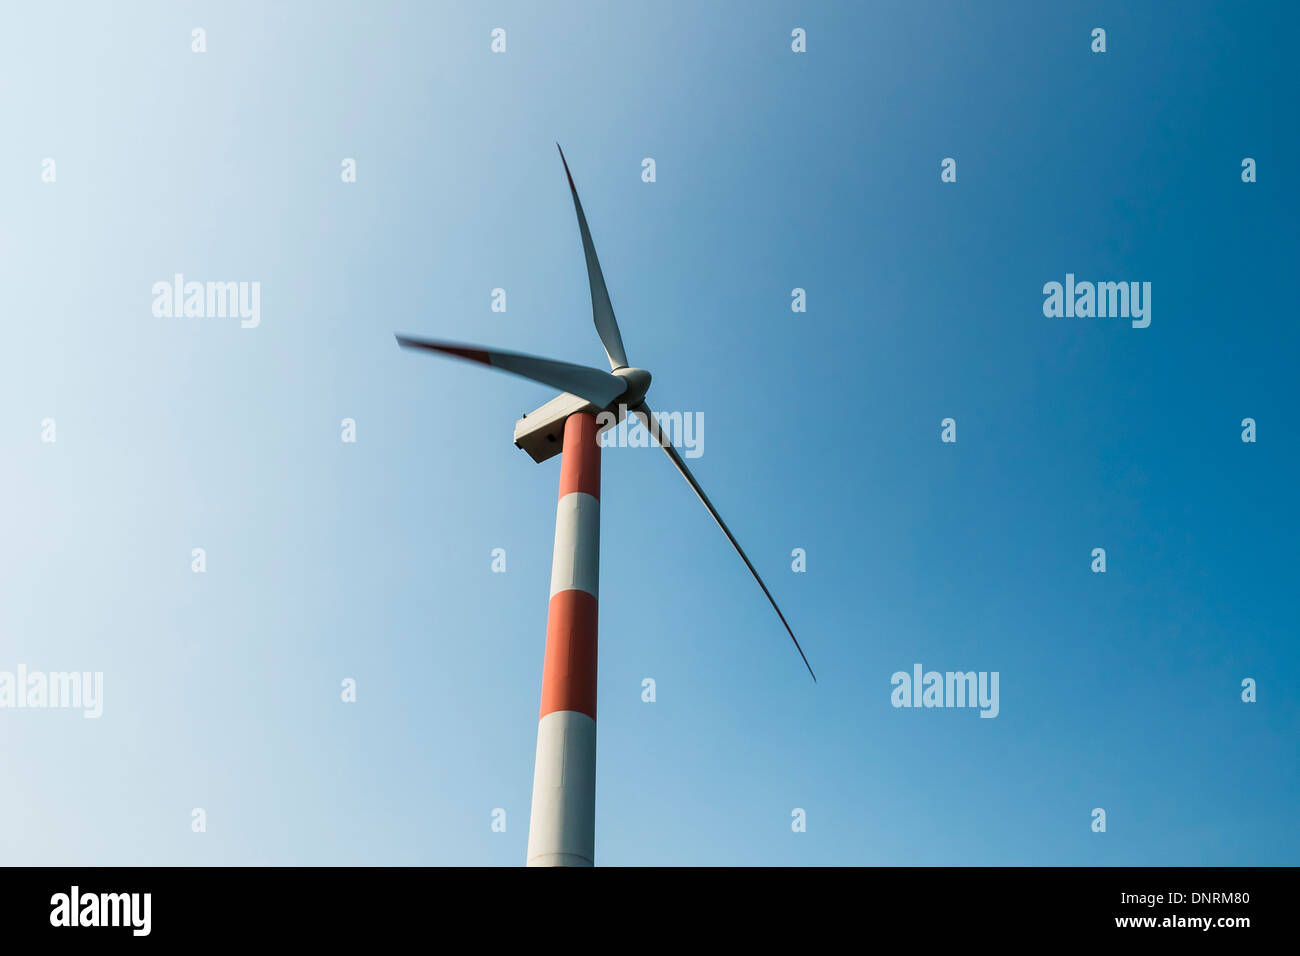 Shihmen Wind Power Station, New Taipei, Taiwan Stockbild